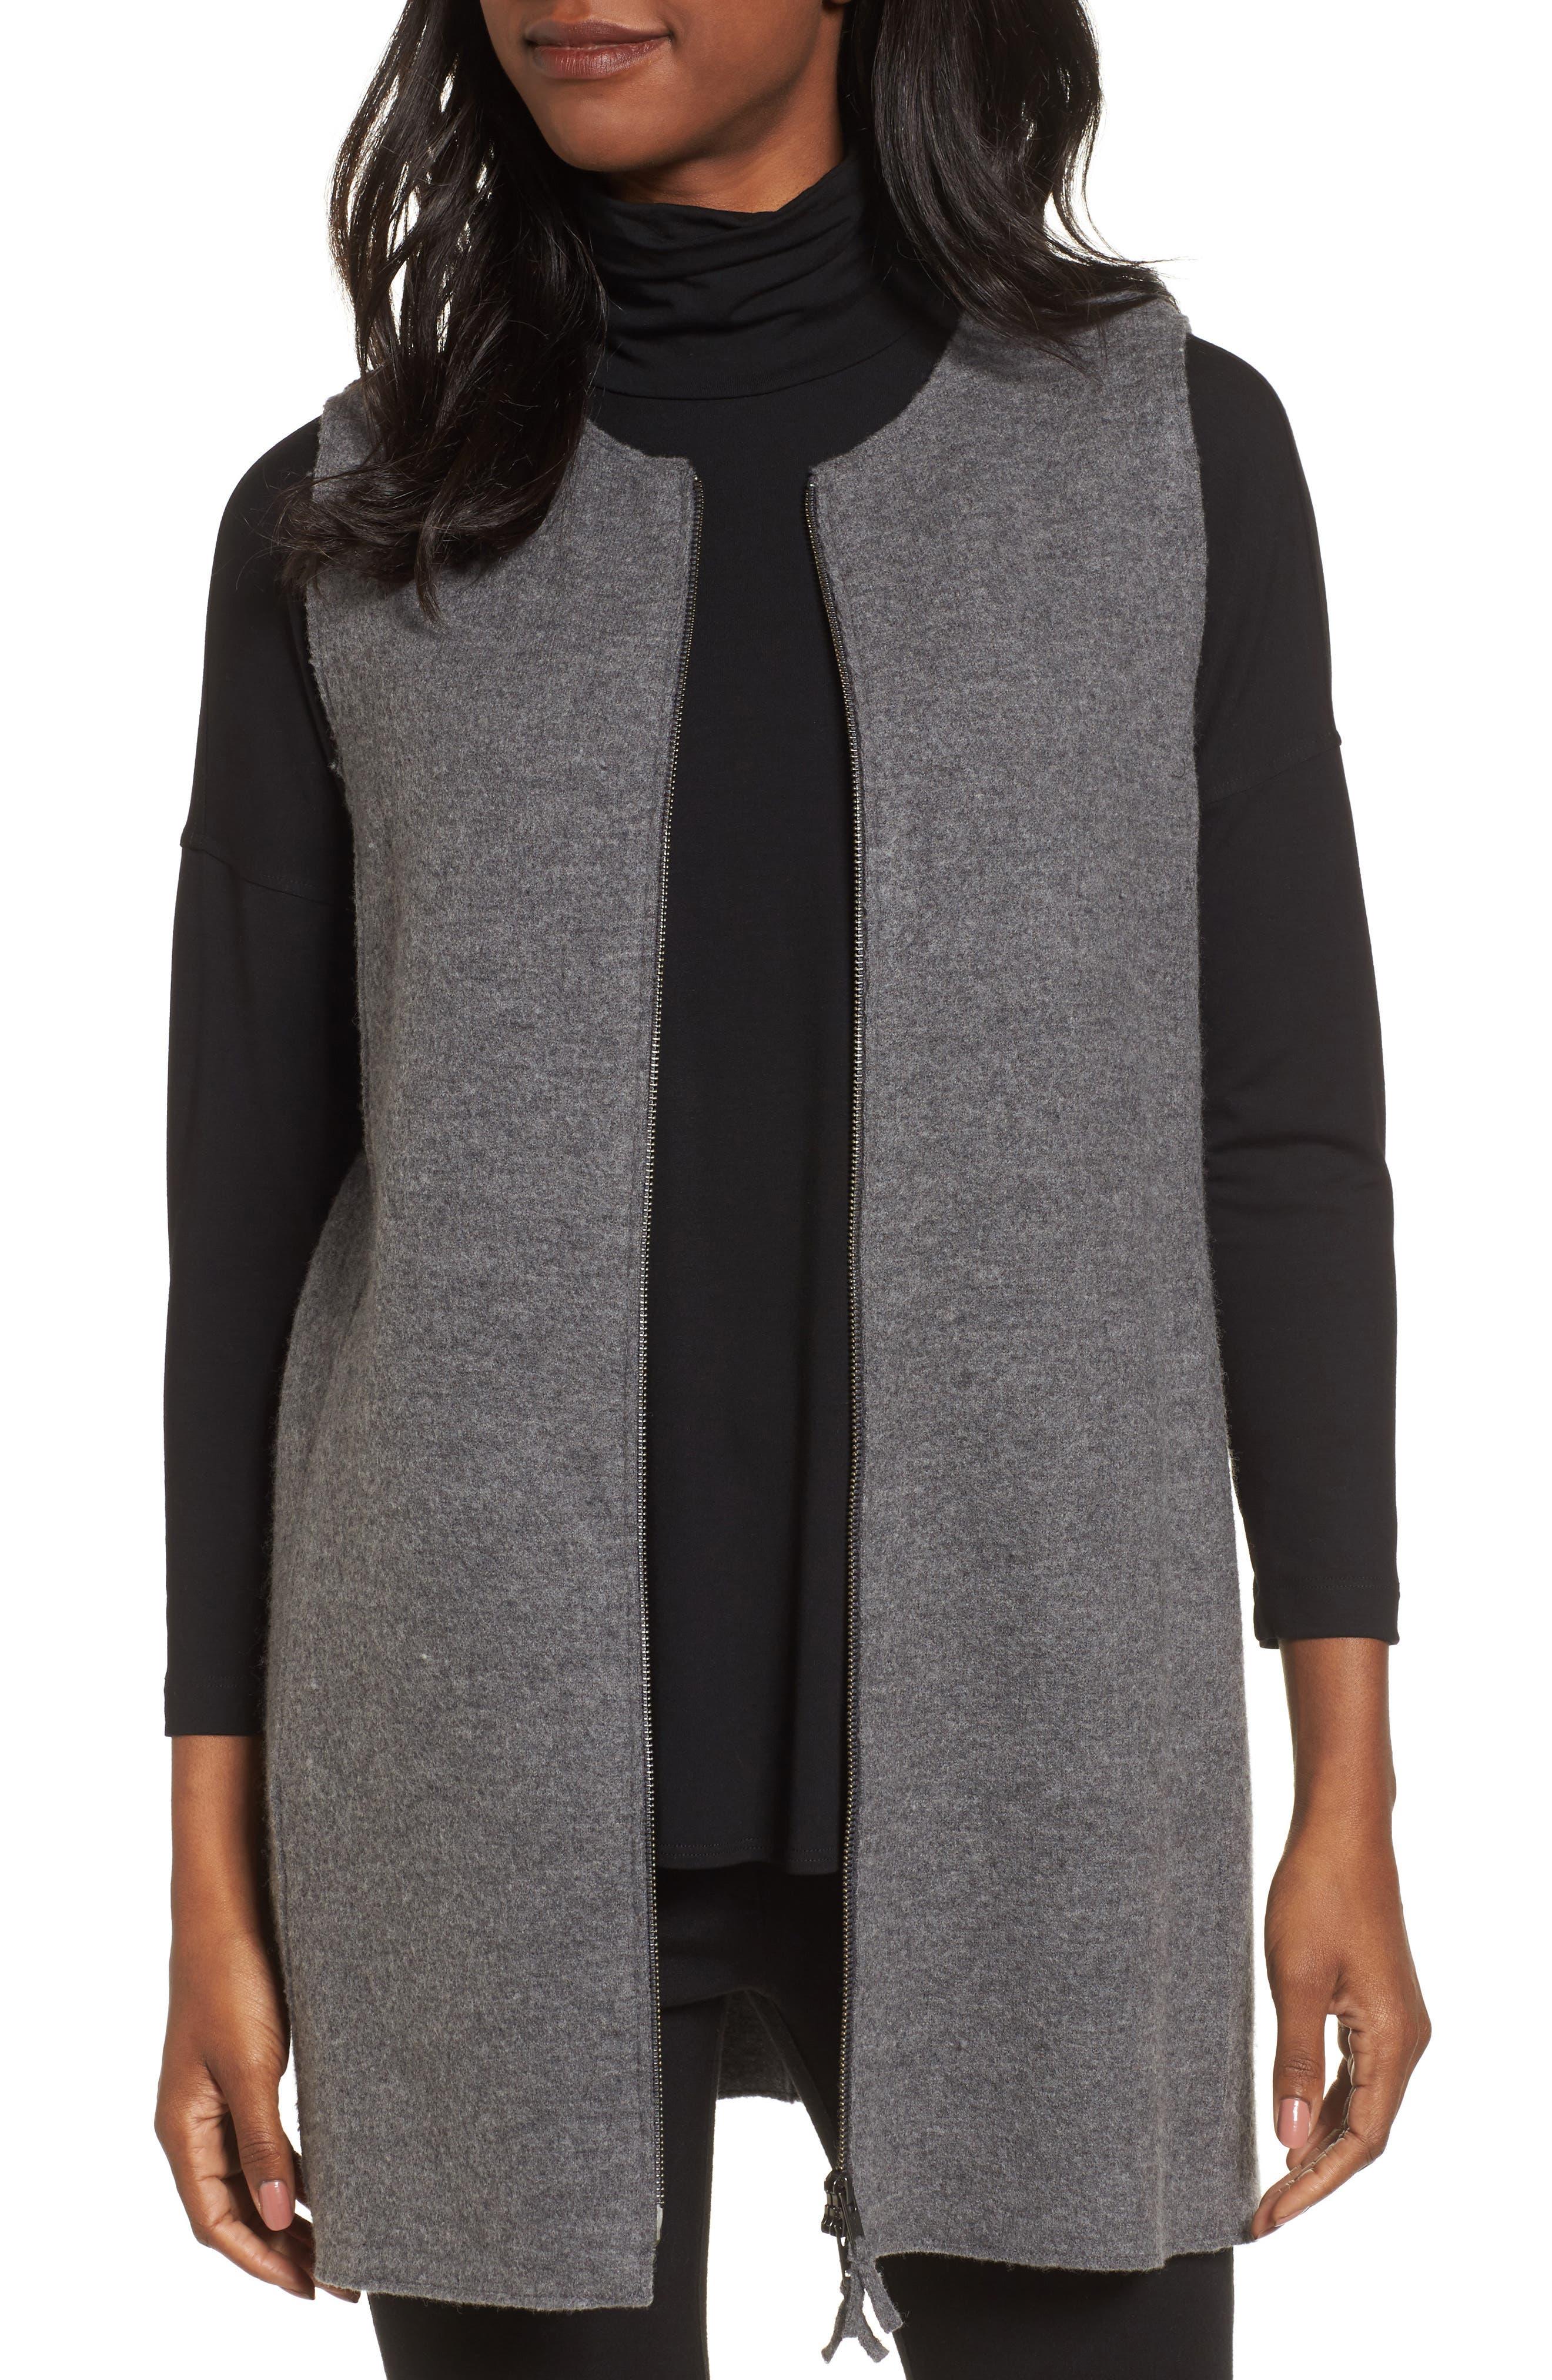 Alternate Image 1 Selected - Eileen Fisher Long Boiled Wool Vest (Regular & Petite)